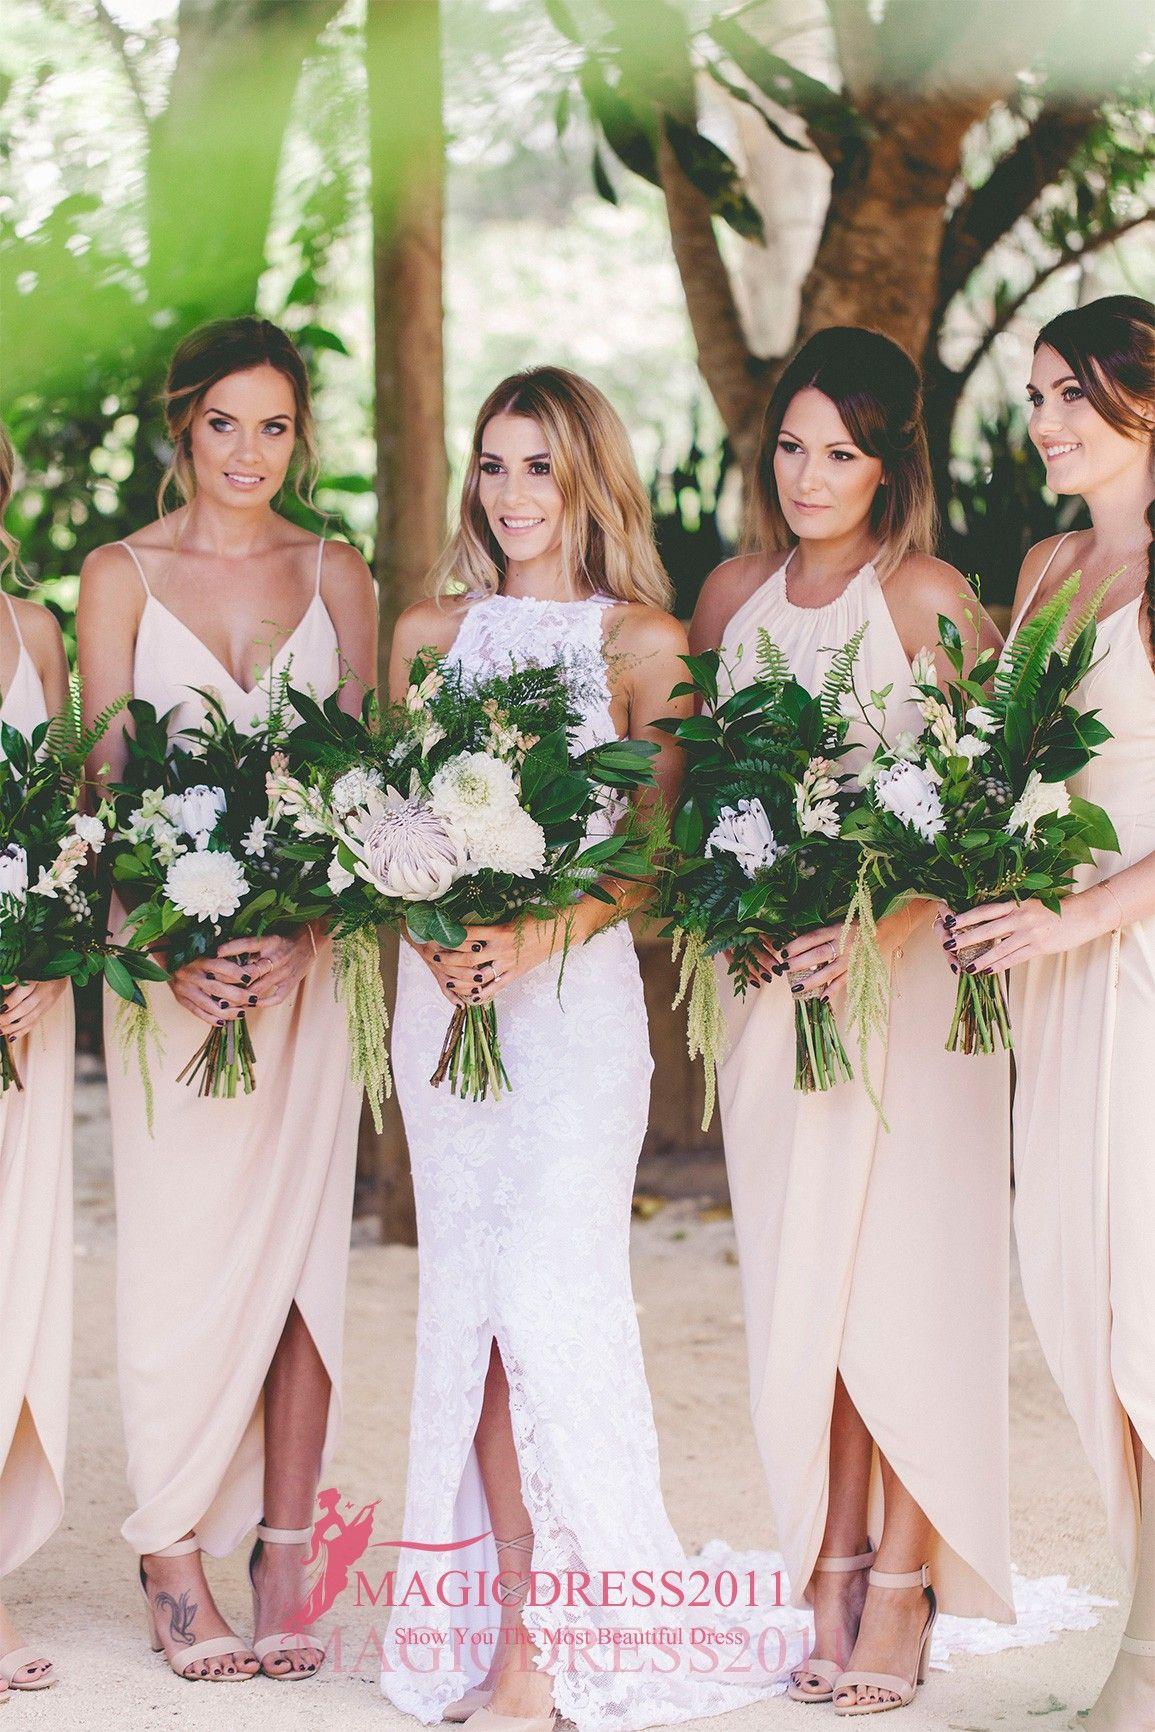 2019 Boho Beach Chiffon Bridesmaid Платья A-Line Deep V-образным вырезом Расколачатая вечеринка PROME PROM PREP PROPLES BANKLE REVELE REPEENT HAND